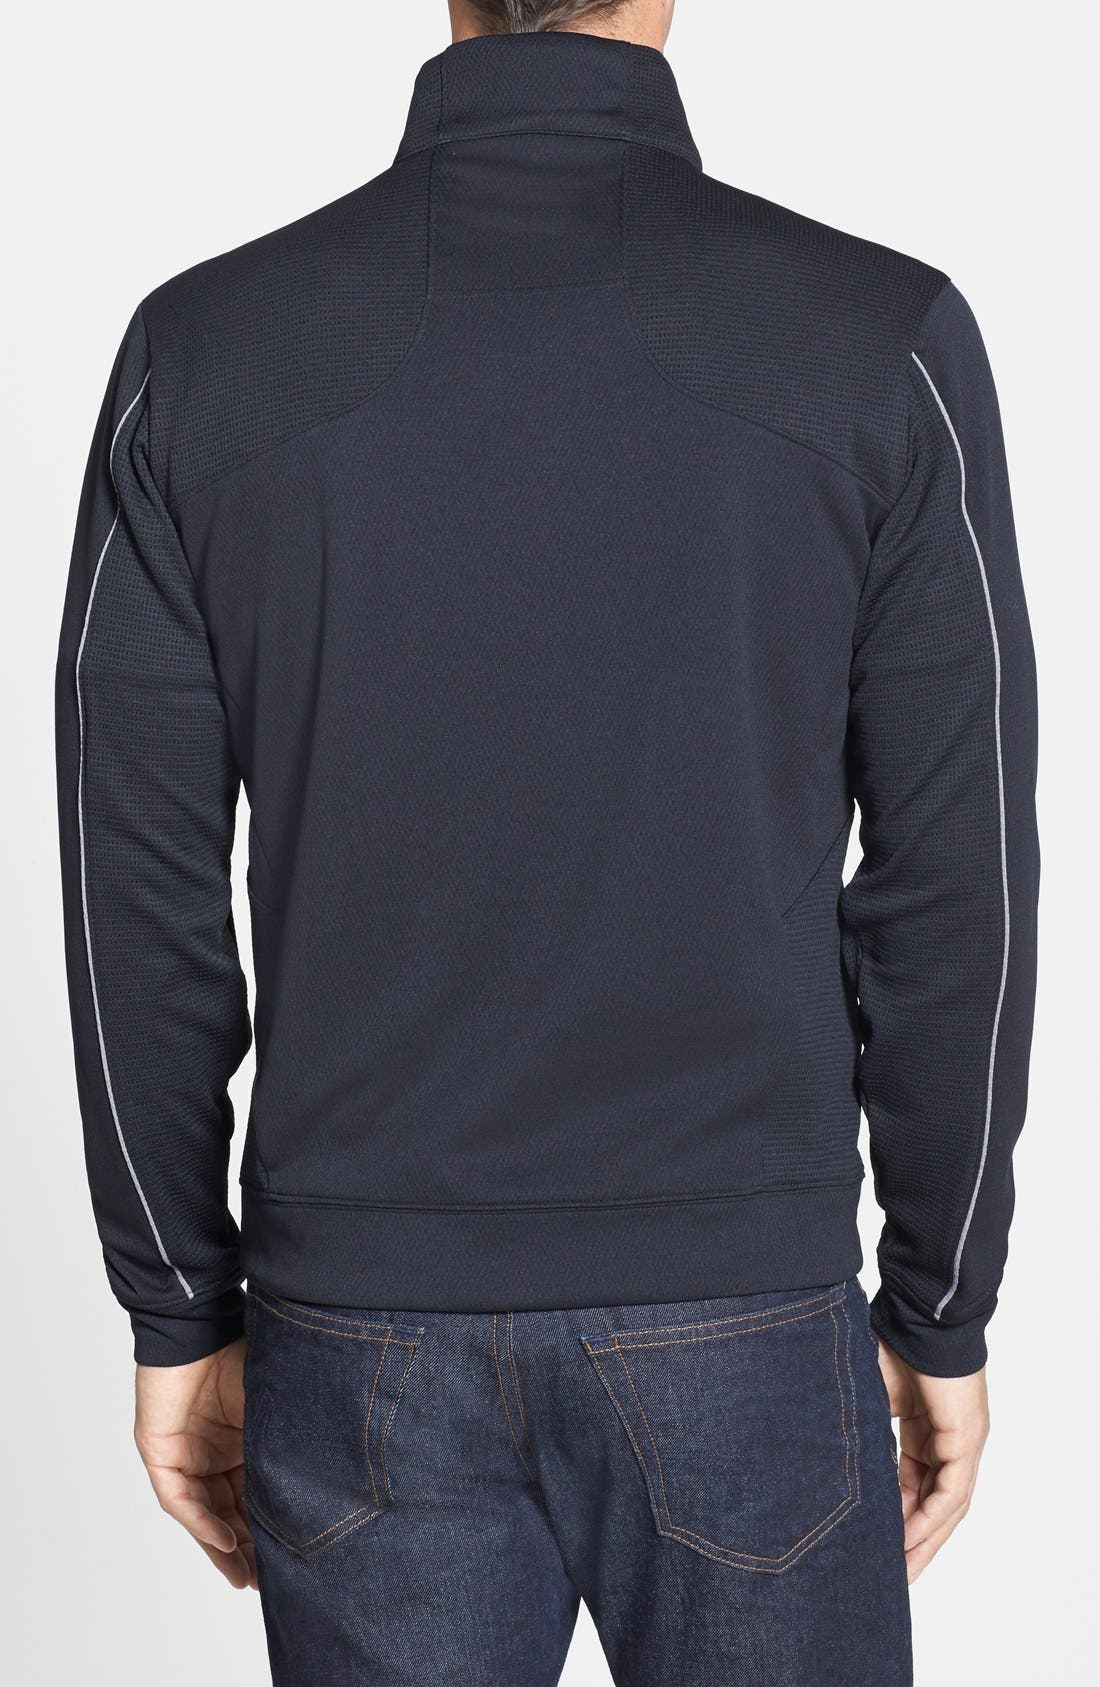 Alternate Image 2  - Cutter & Buck San Francisco 49ers - Edge DryTec Moisture Wicking Half Zip Pullover